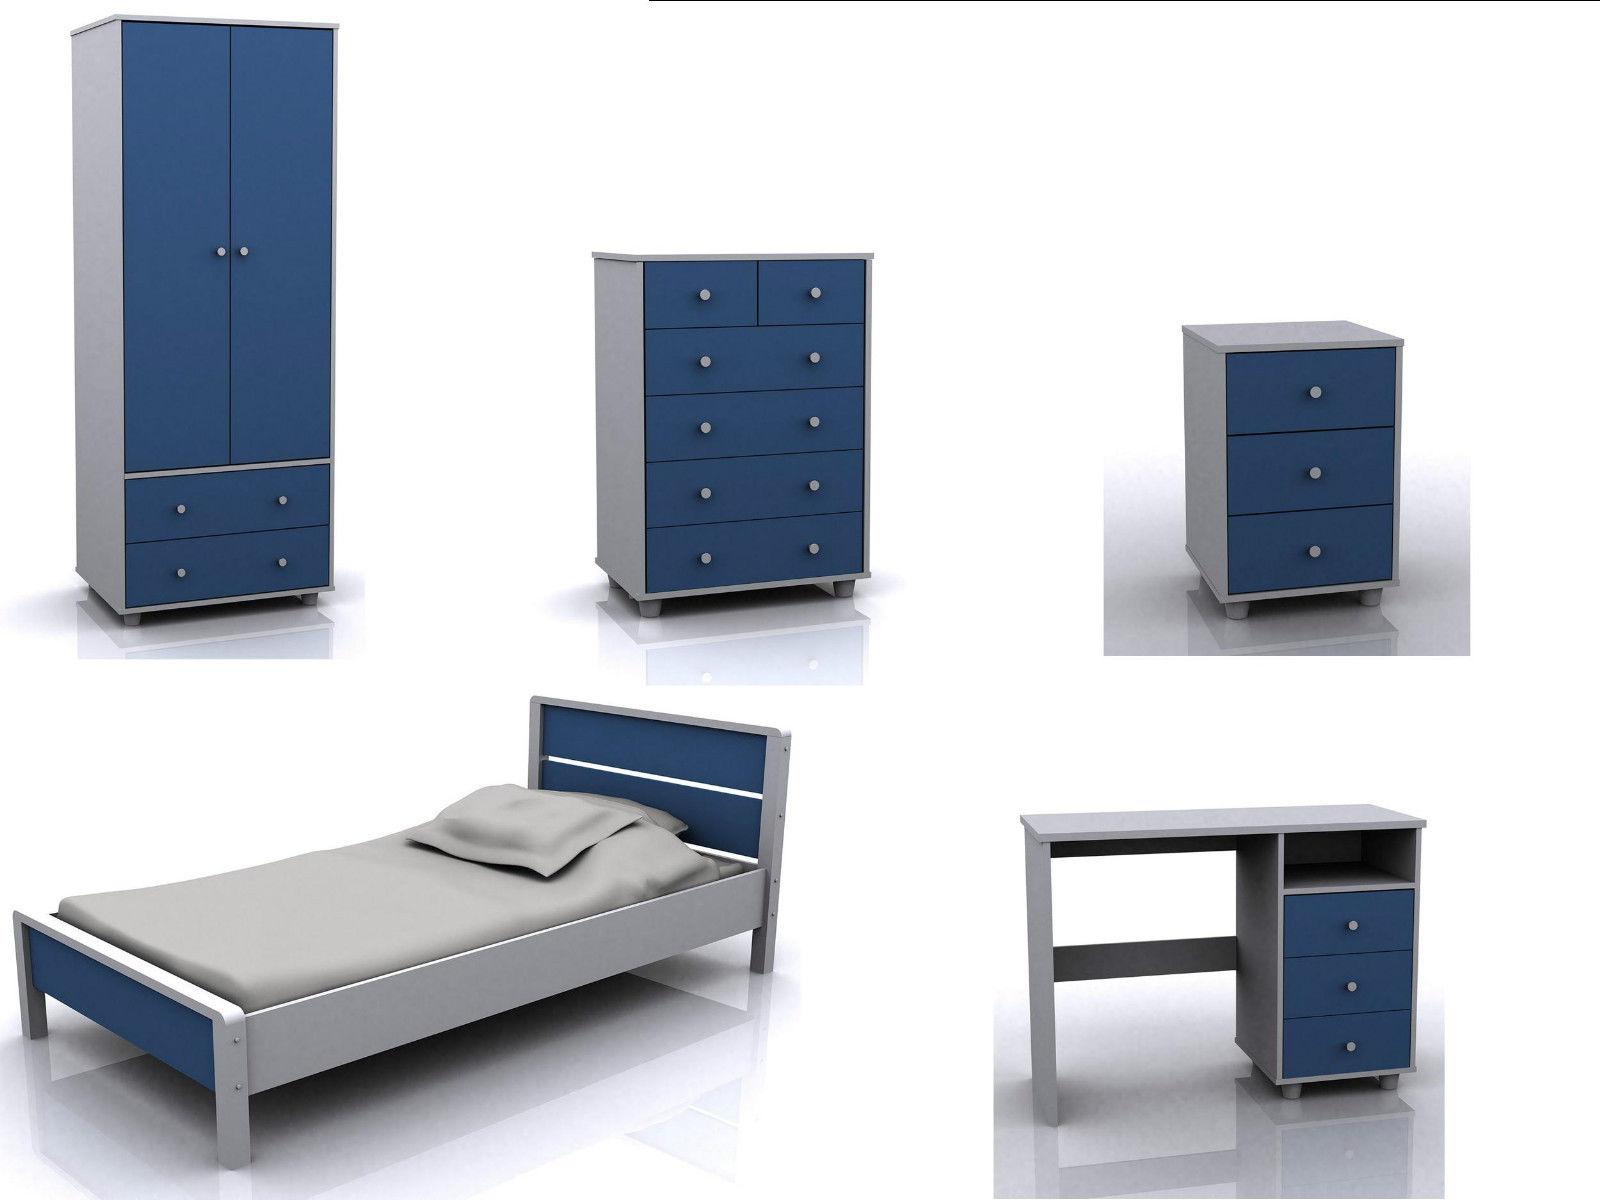 Miami Bedroom Furniture Boys Blue Bedroom Furniture Miami Range Wardrobe Bed Chest